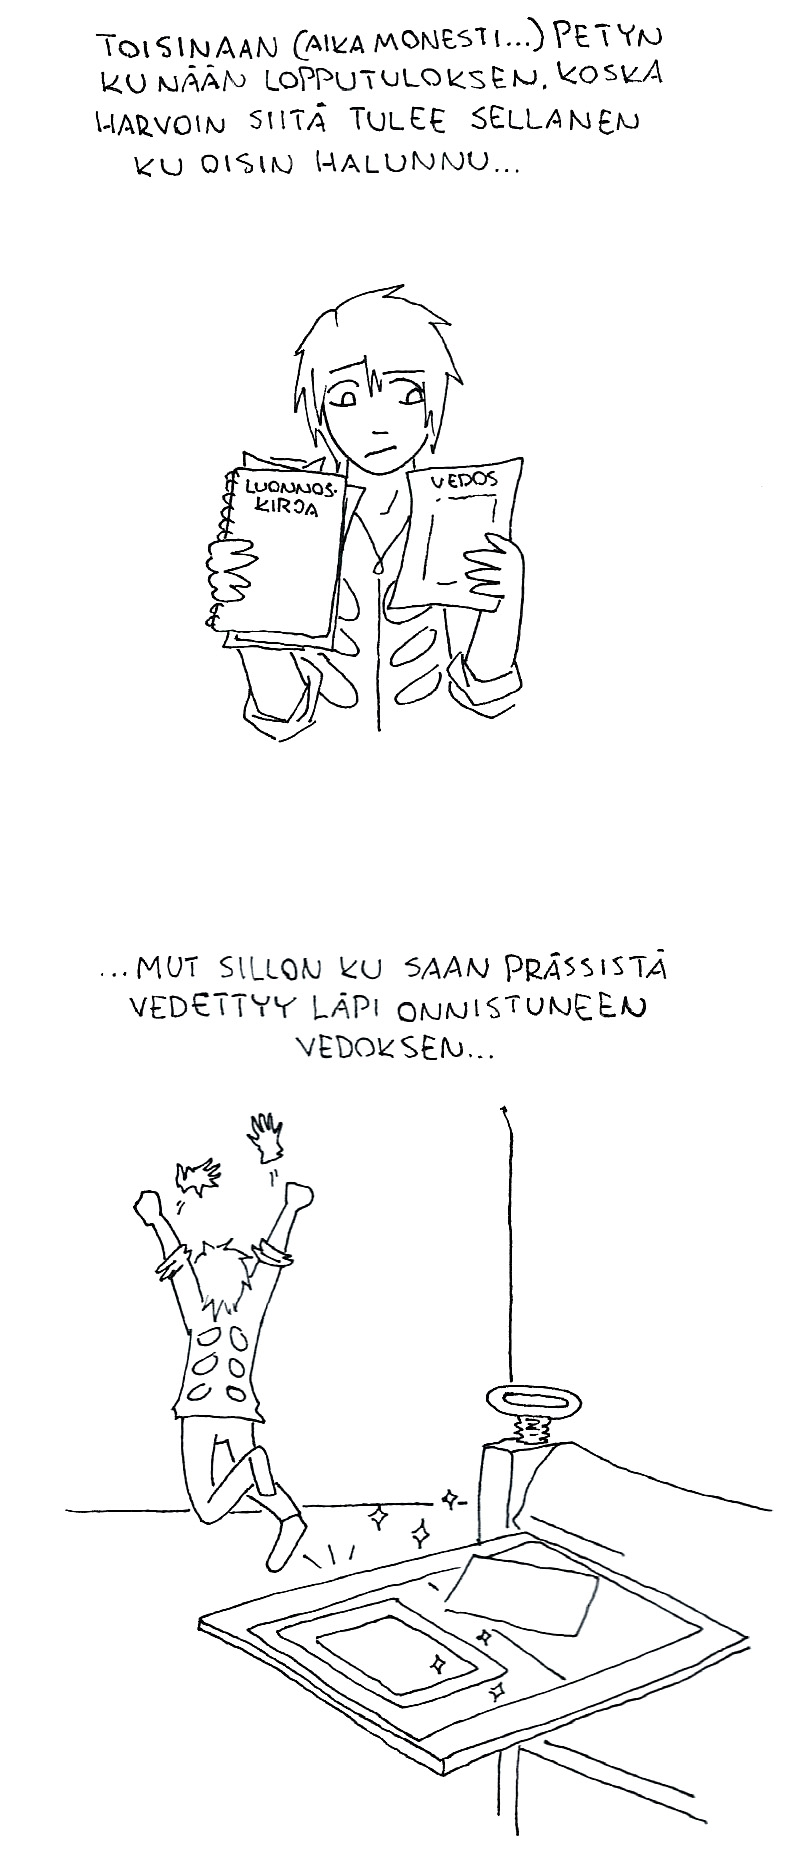 saerjis168